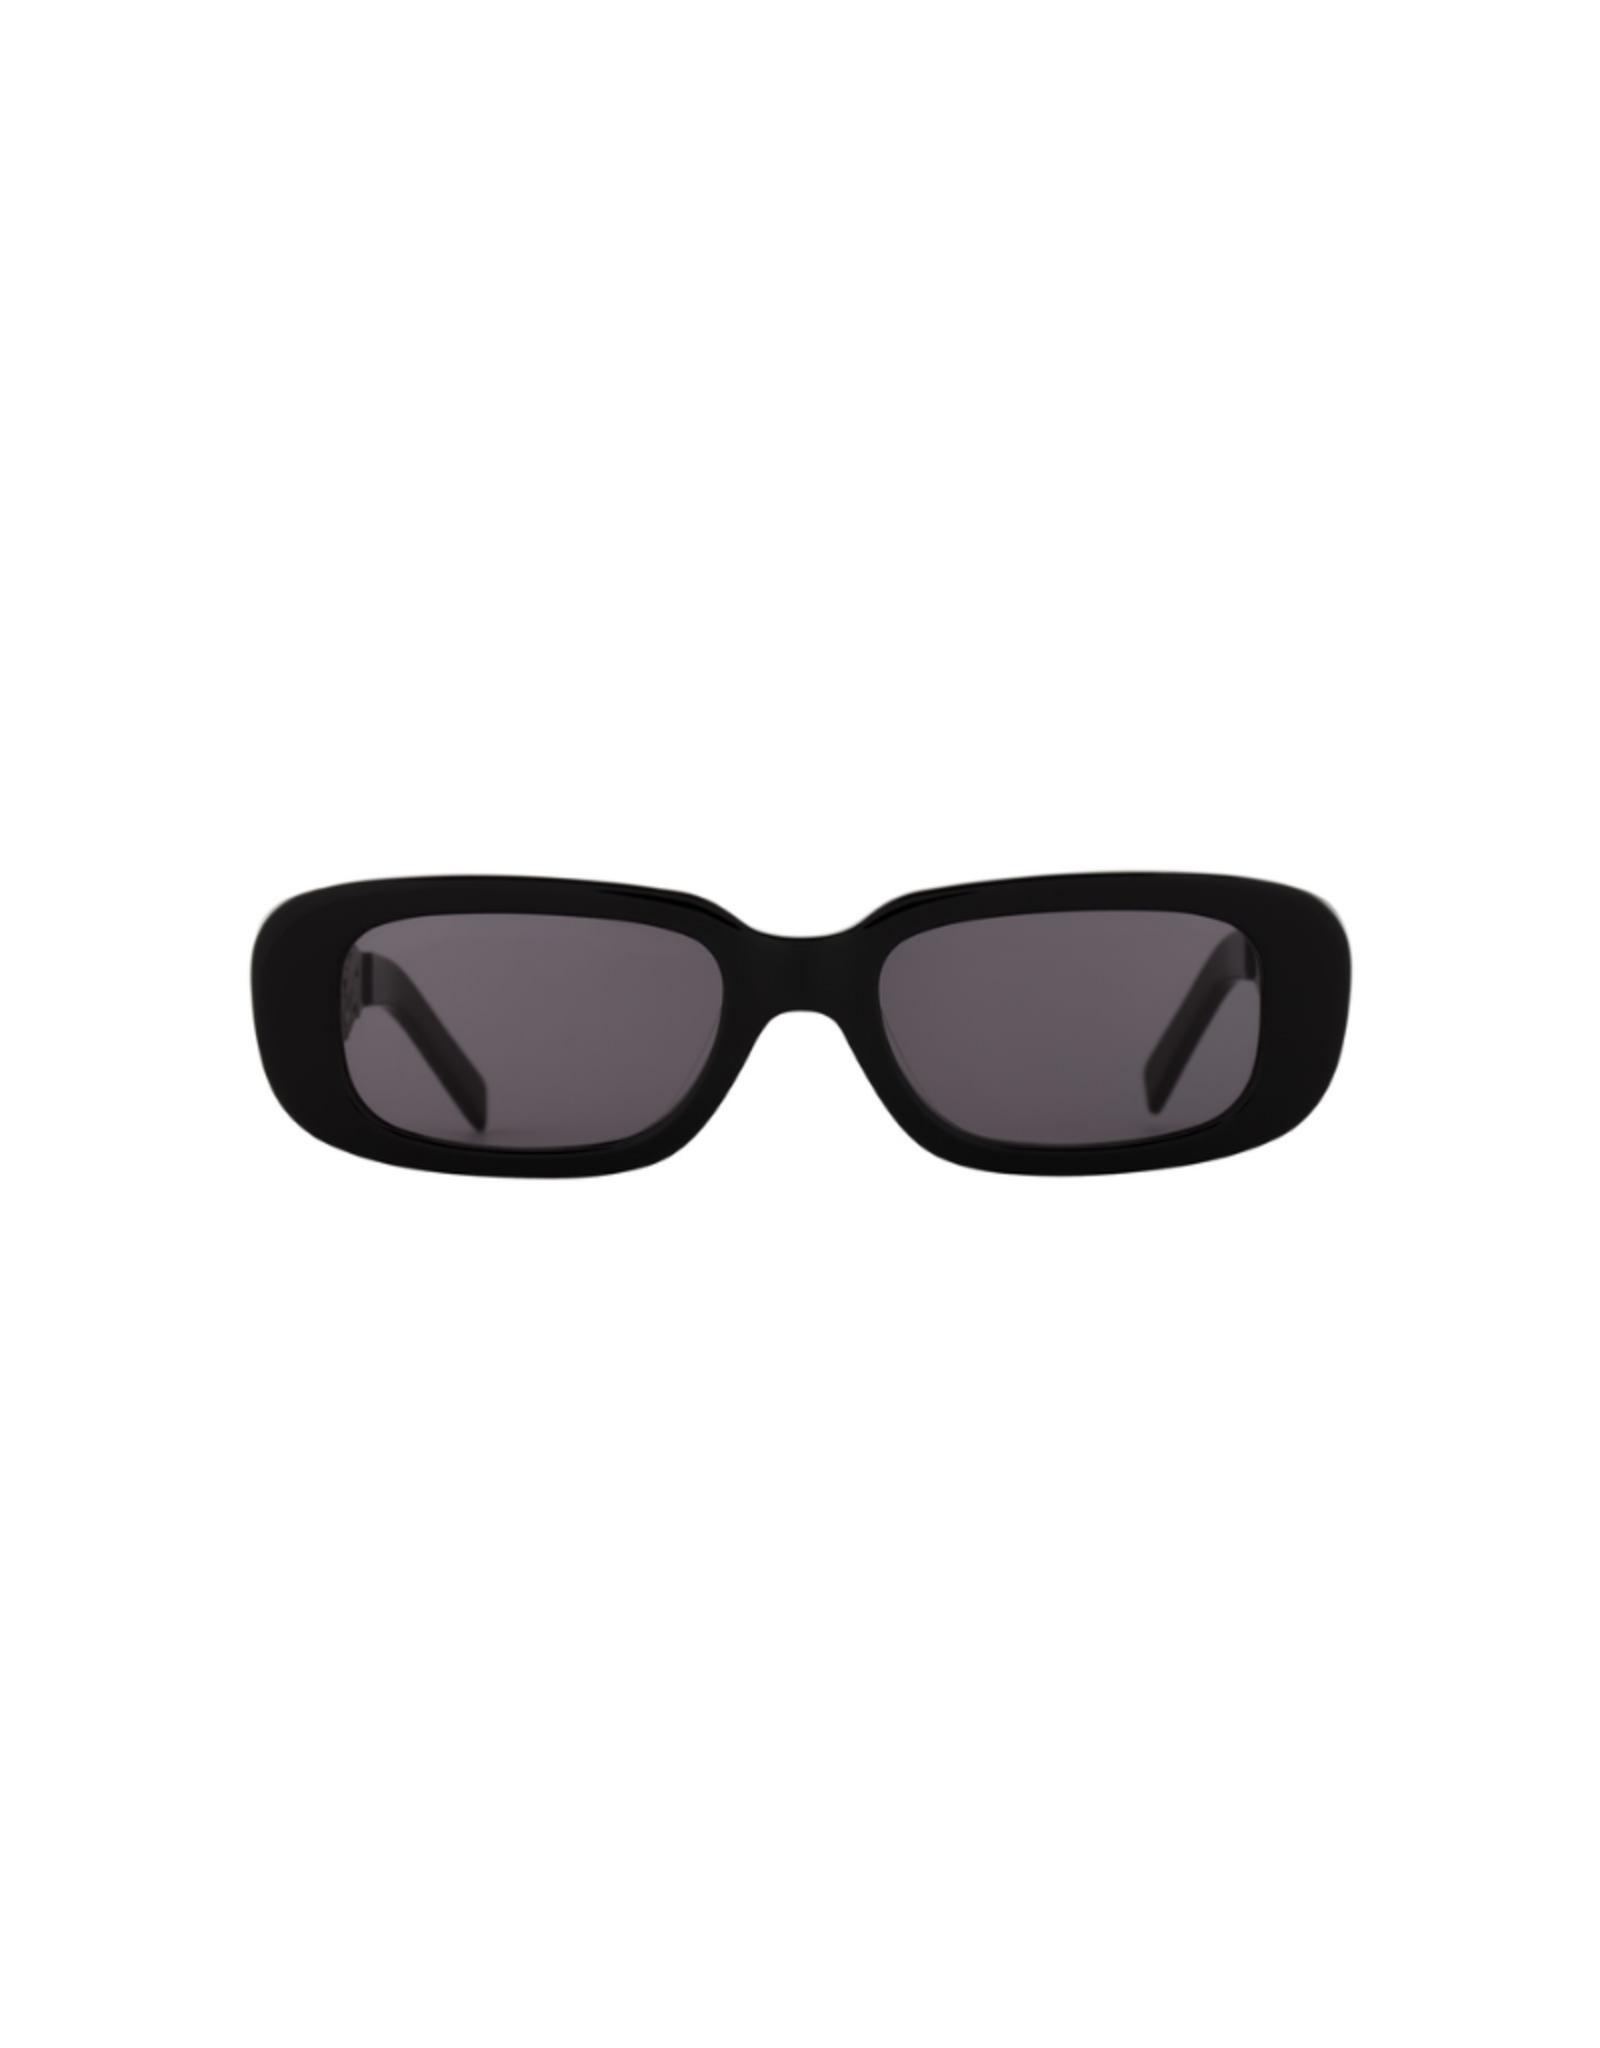 Amber Sceats Maison Sunglasses